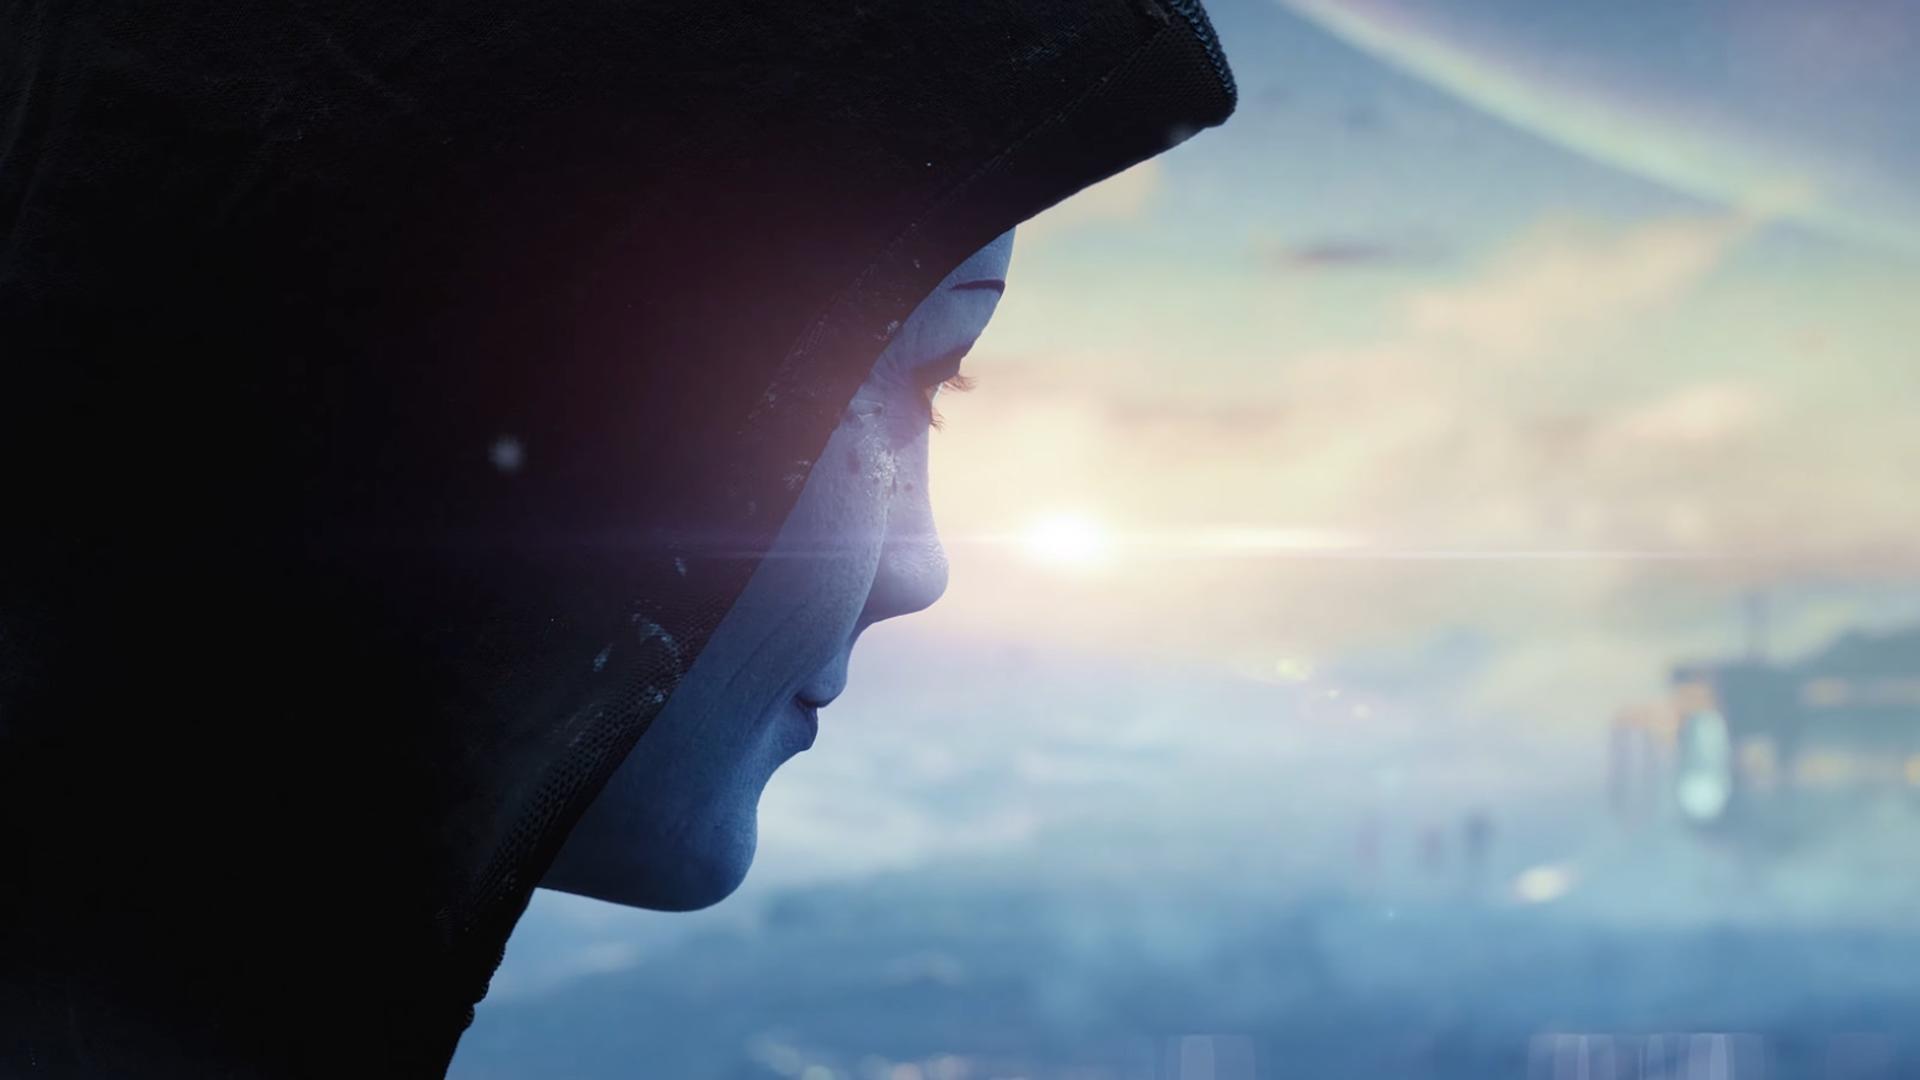 mass effect trailer game awards 2020 une